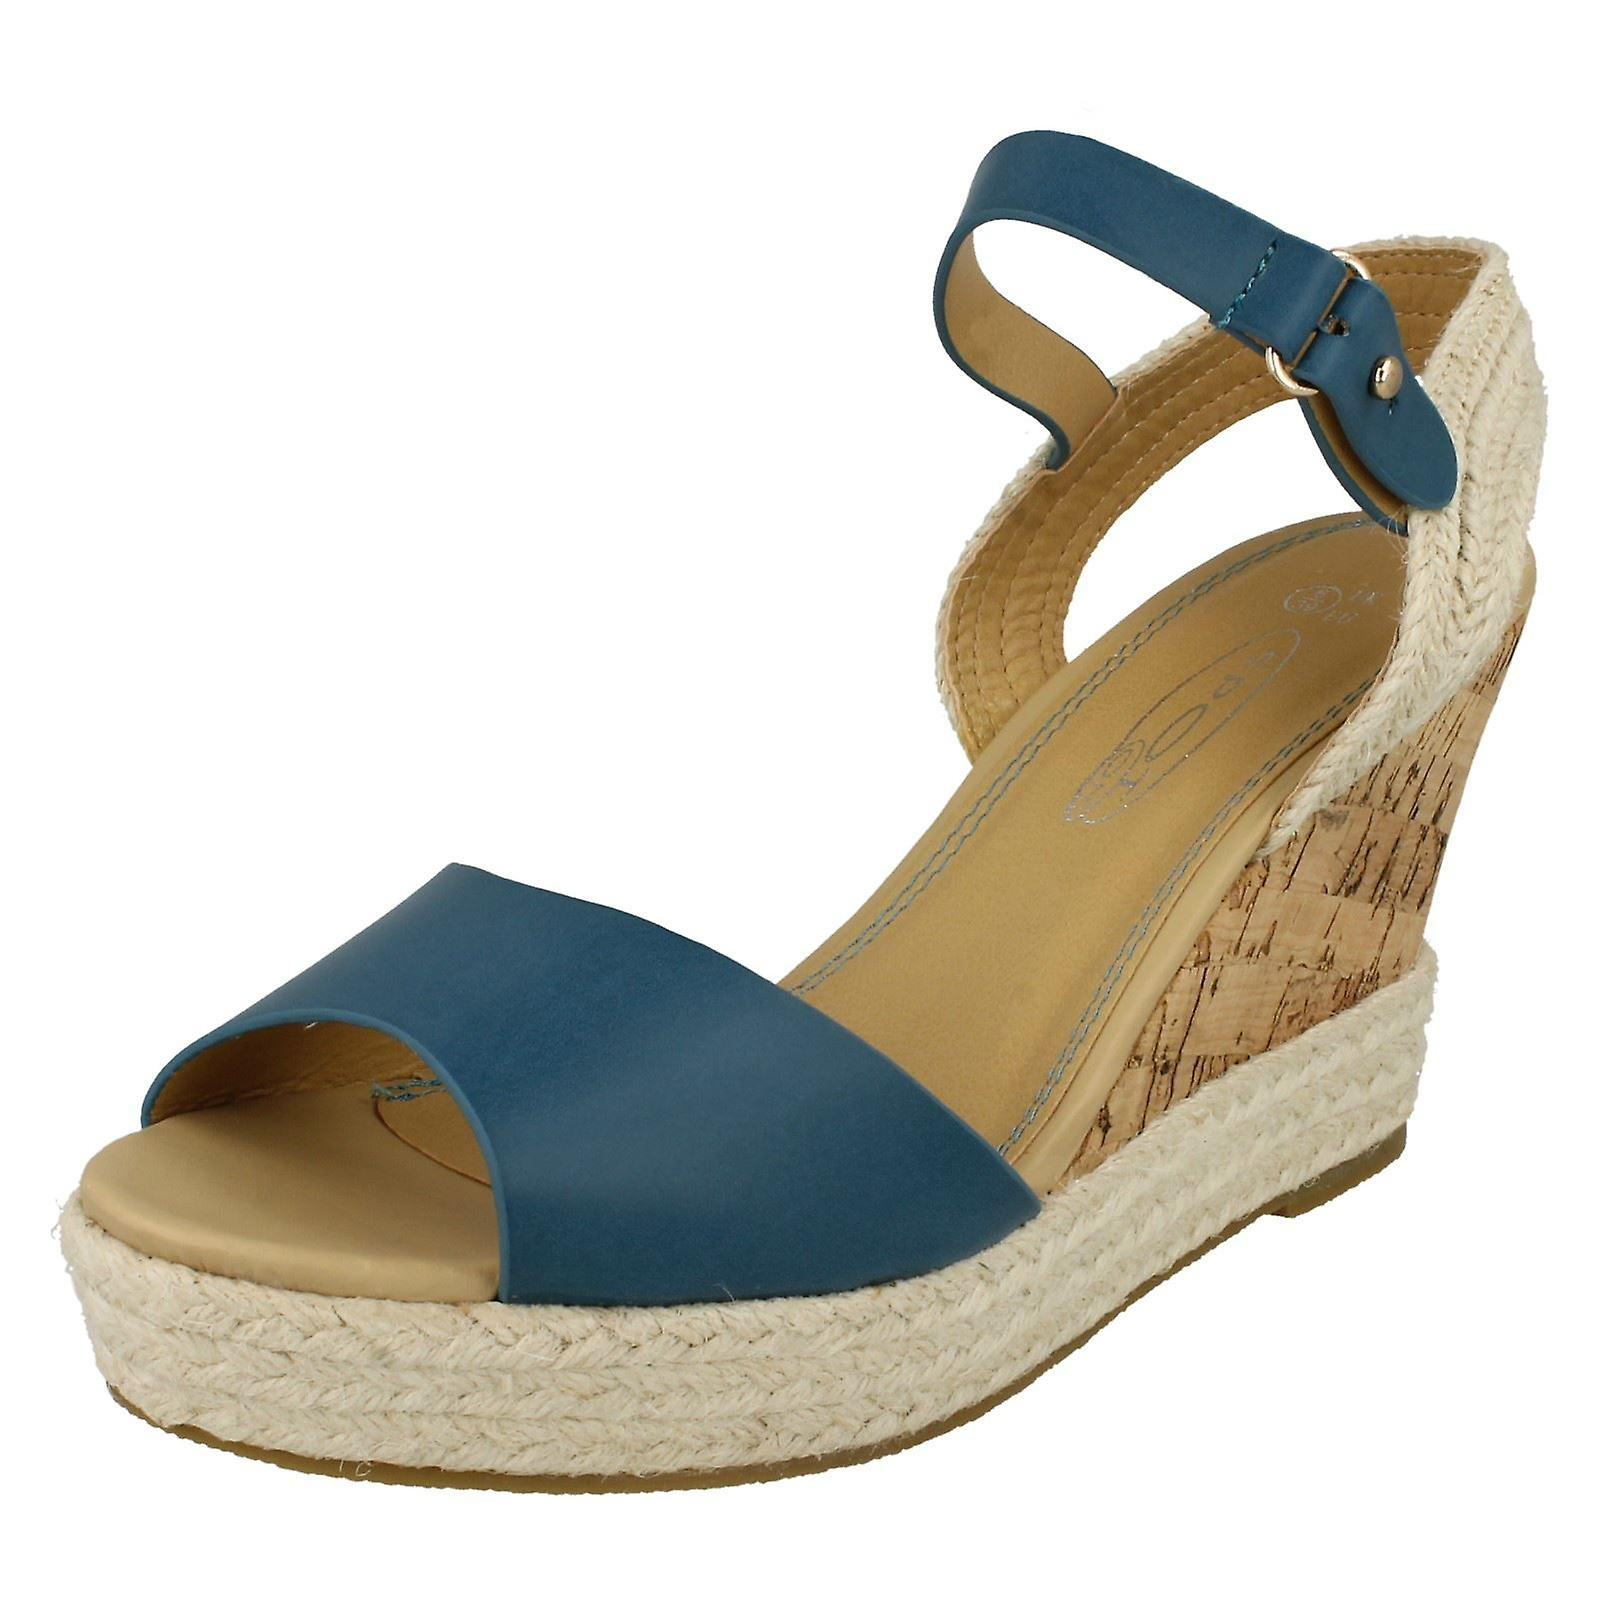 Ladies Sling Back Espadrille High Sandal Wedged O8OqU7wA